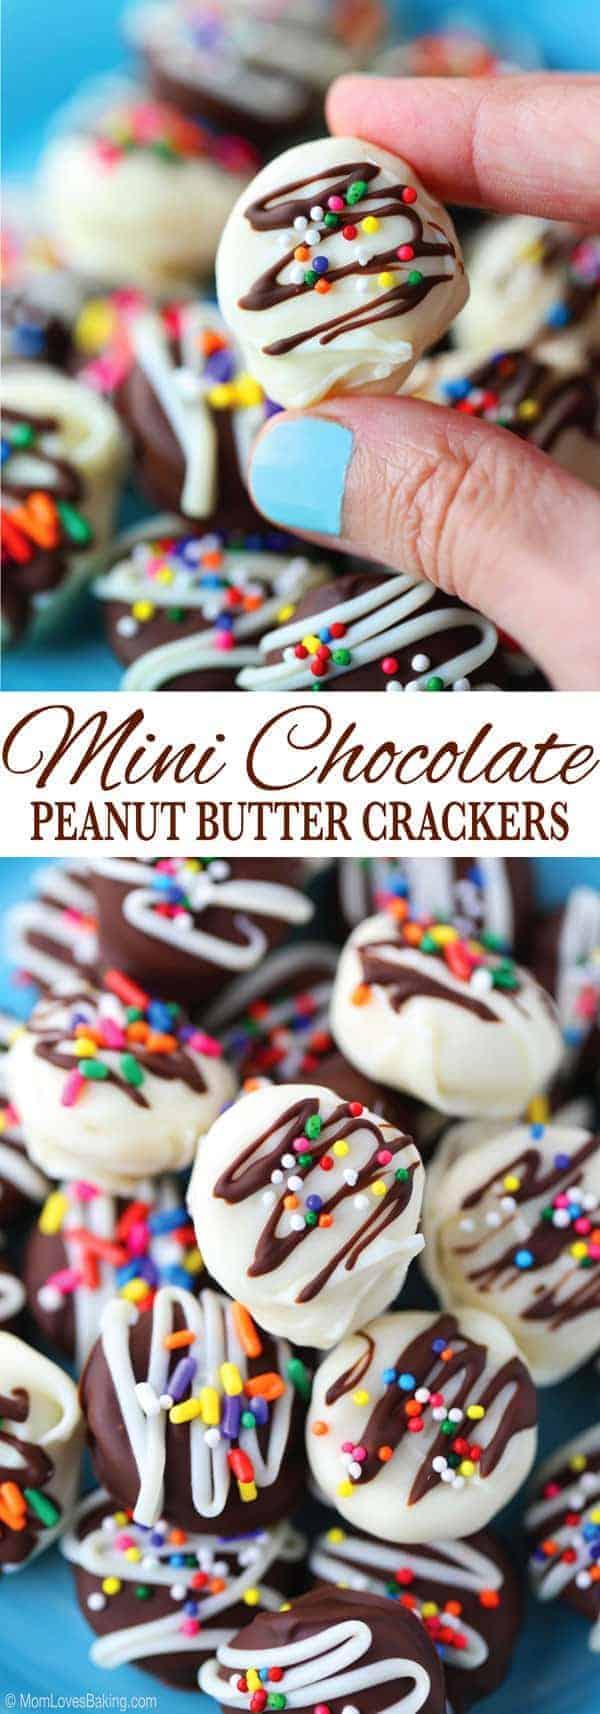 Mini Chocolate Peanut Butter Crackers